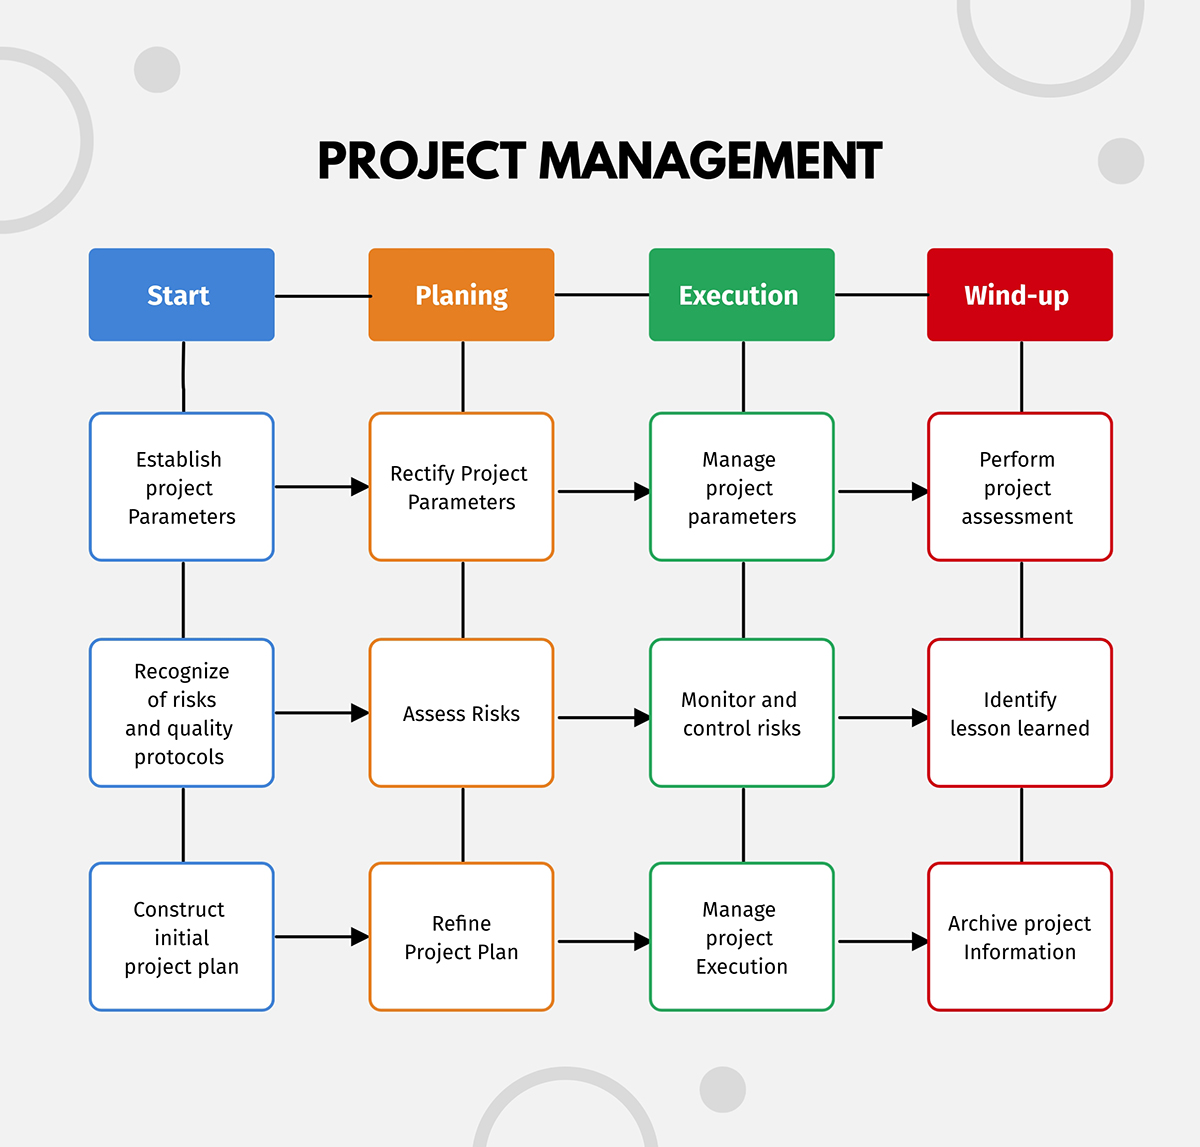 A project management process flowchart template available in Visme.